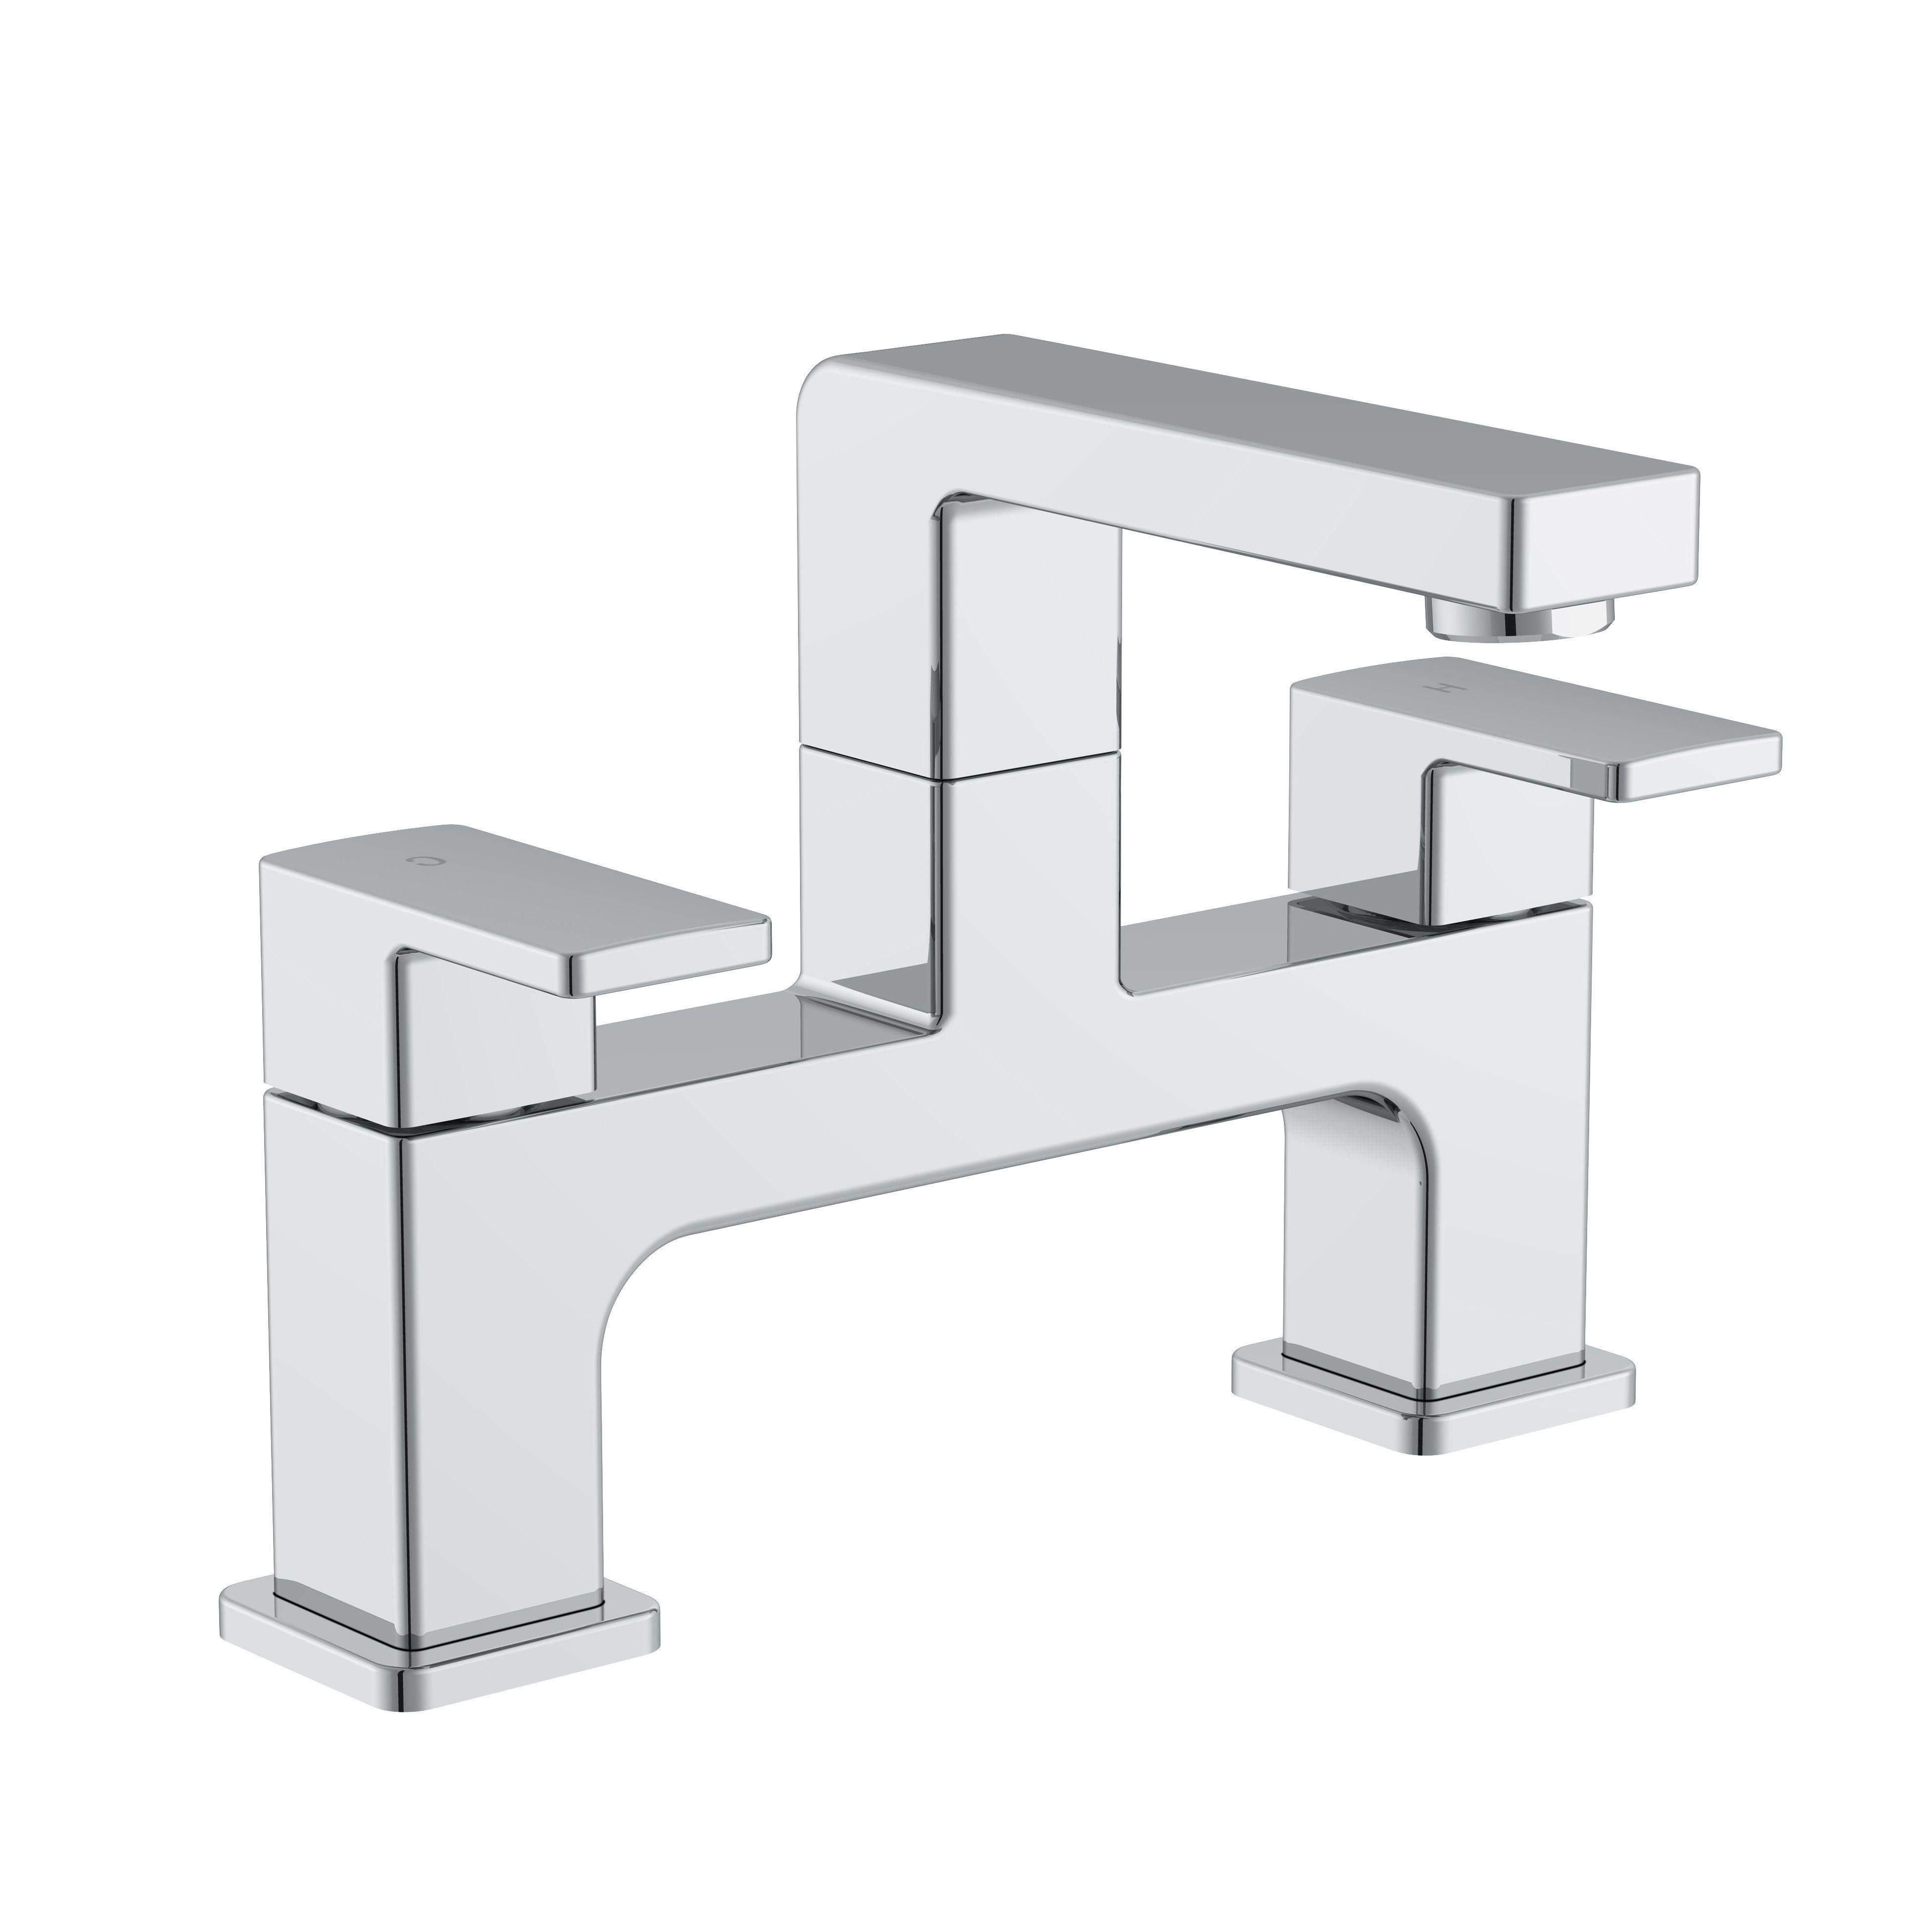 Low Pressure Bathroom Taps -